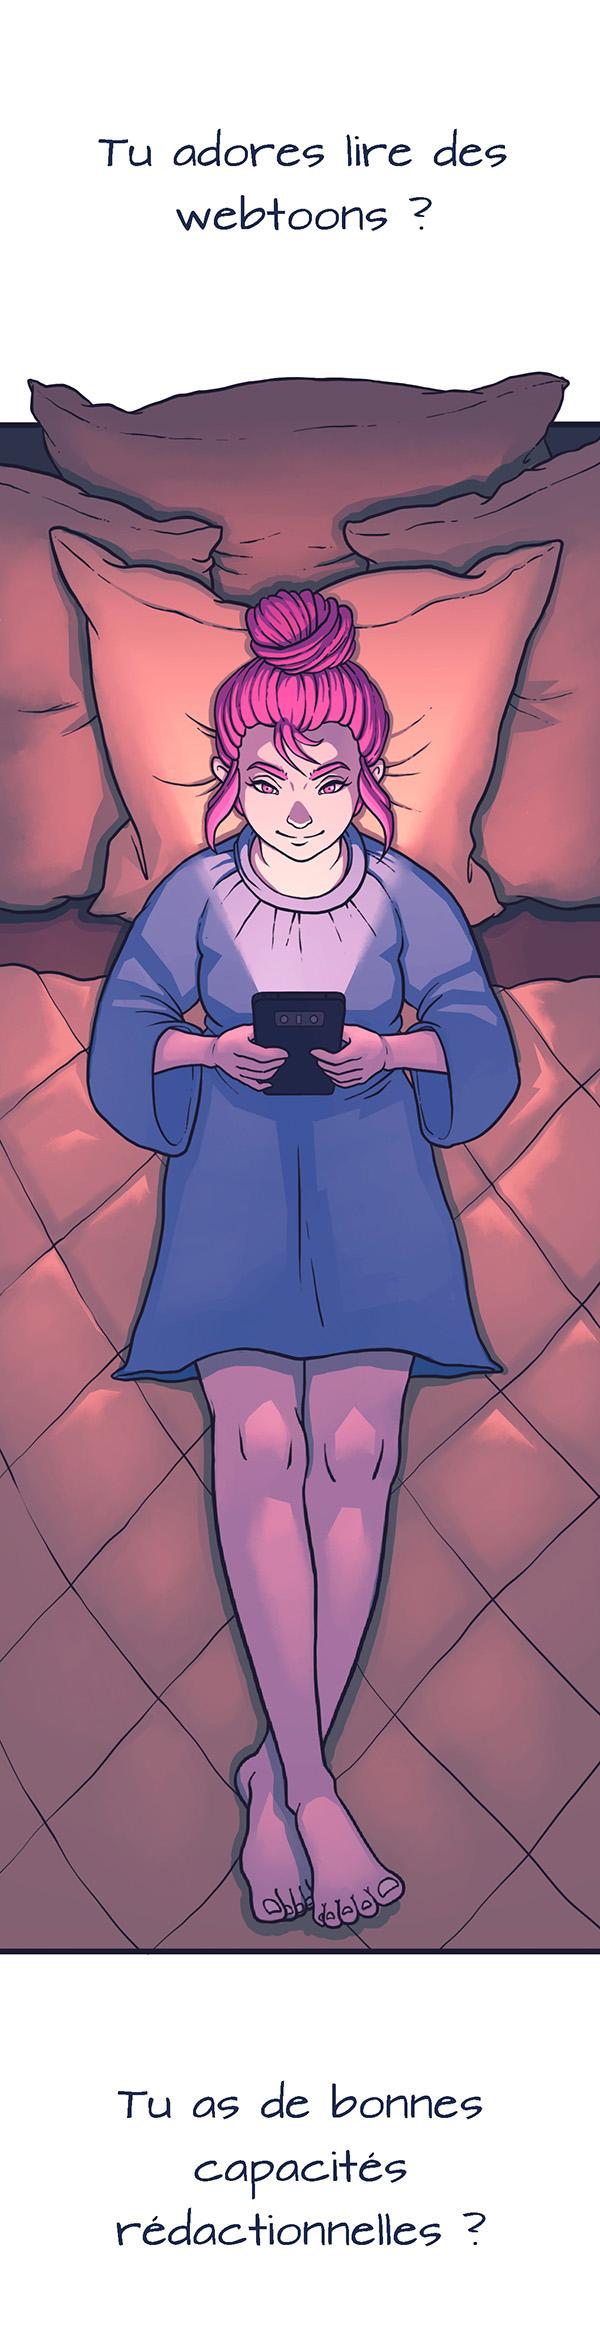 Webtoon Planet : toute l'actu de vos webtoons favoris !